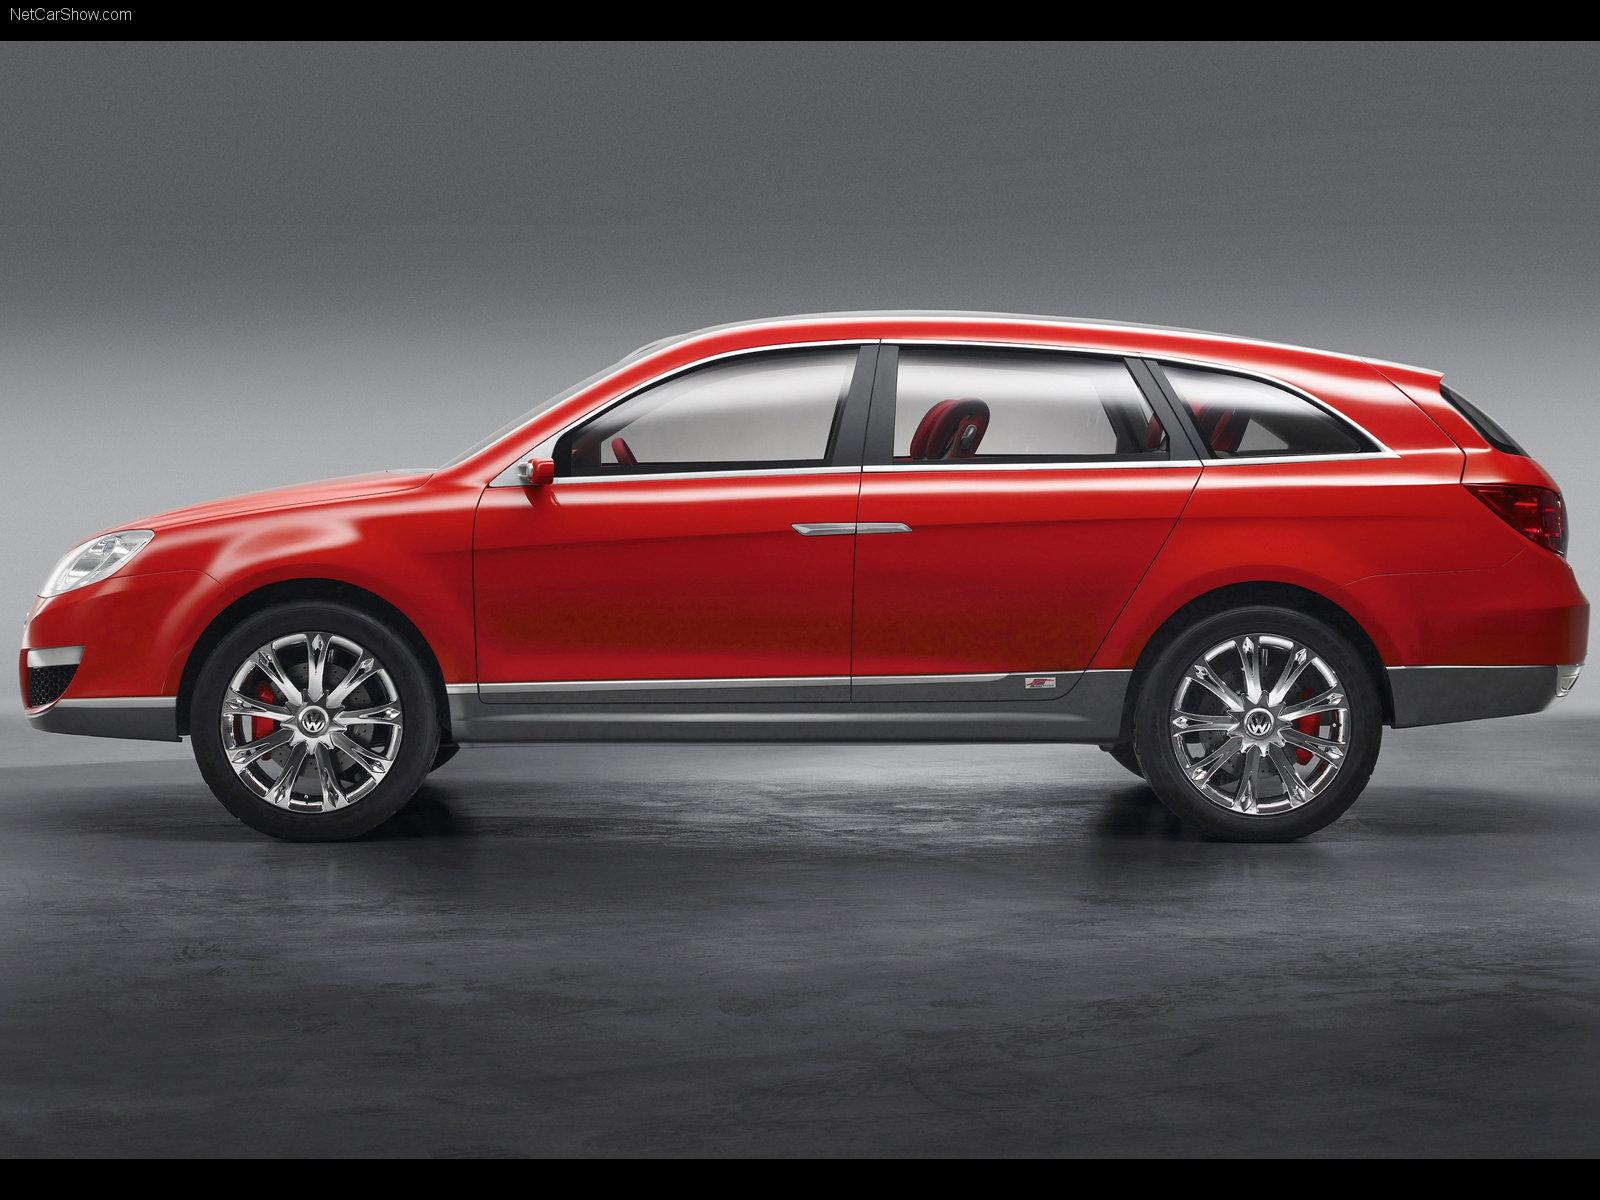 https://www.carsbase.com/photo/Volkswagen-Neeza_mp53_pic_39576.jpg